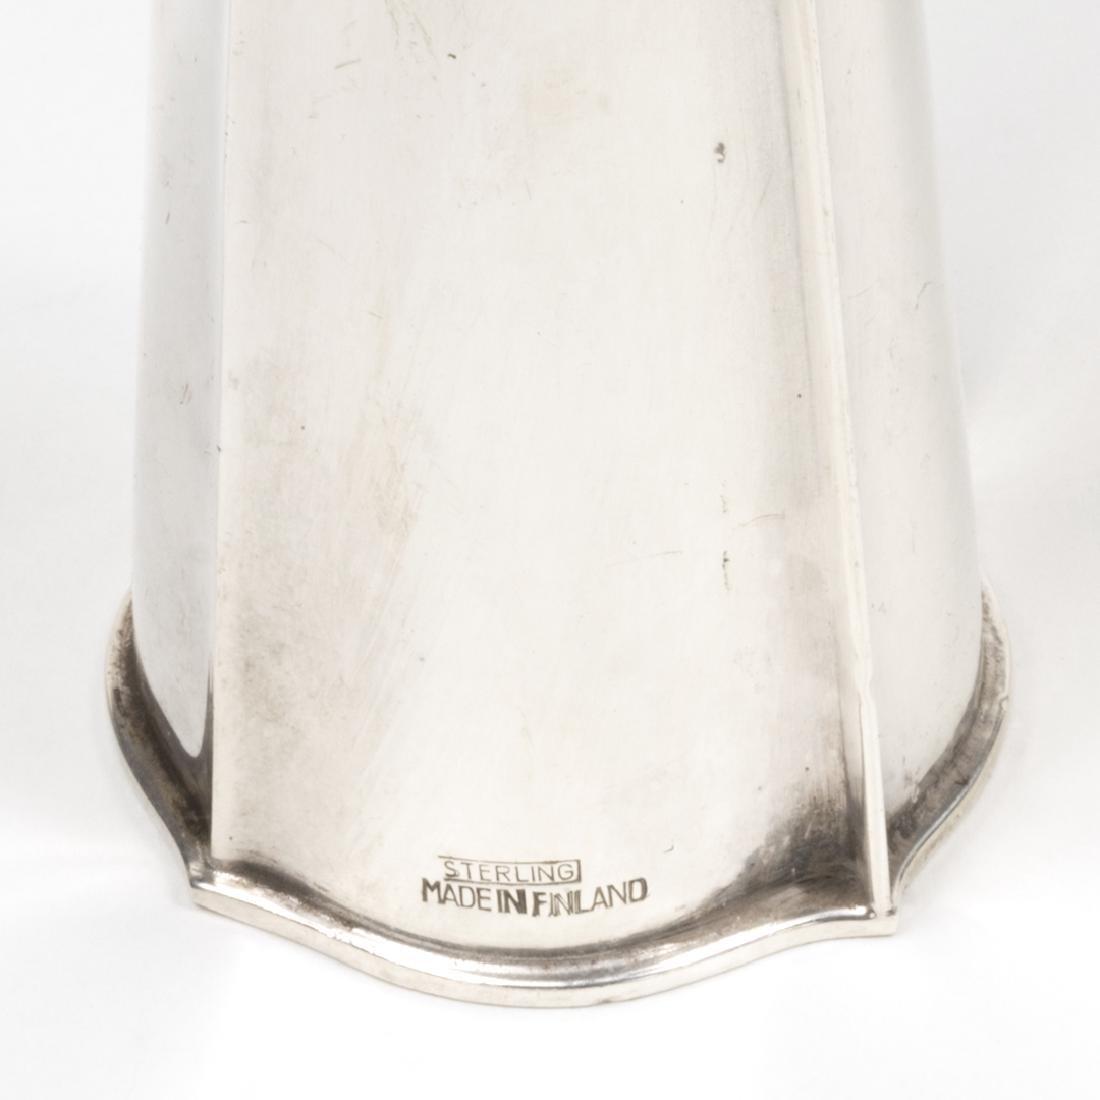 Tapio Wirkkala Sterling Silver Vases (2) - 3